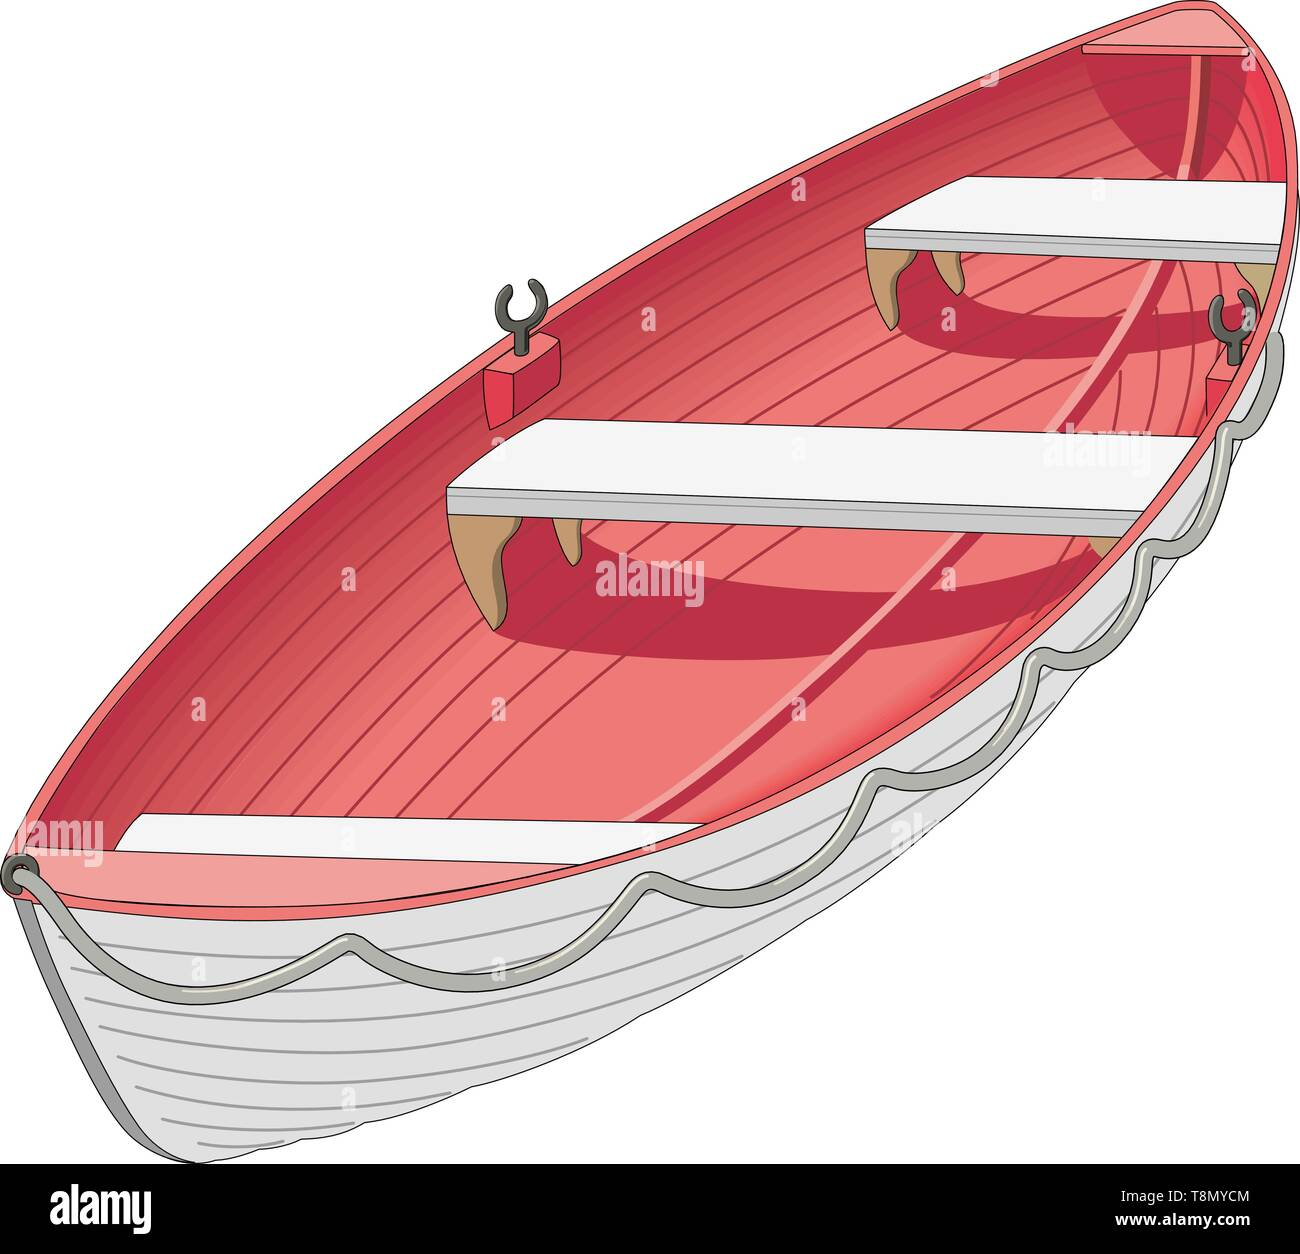 Life Boat Vector Illustration - Stock Vector